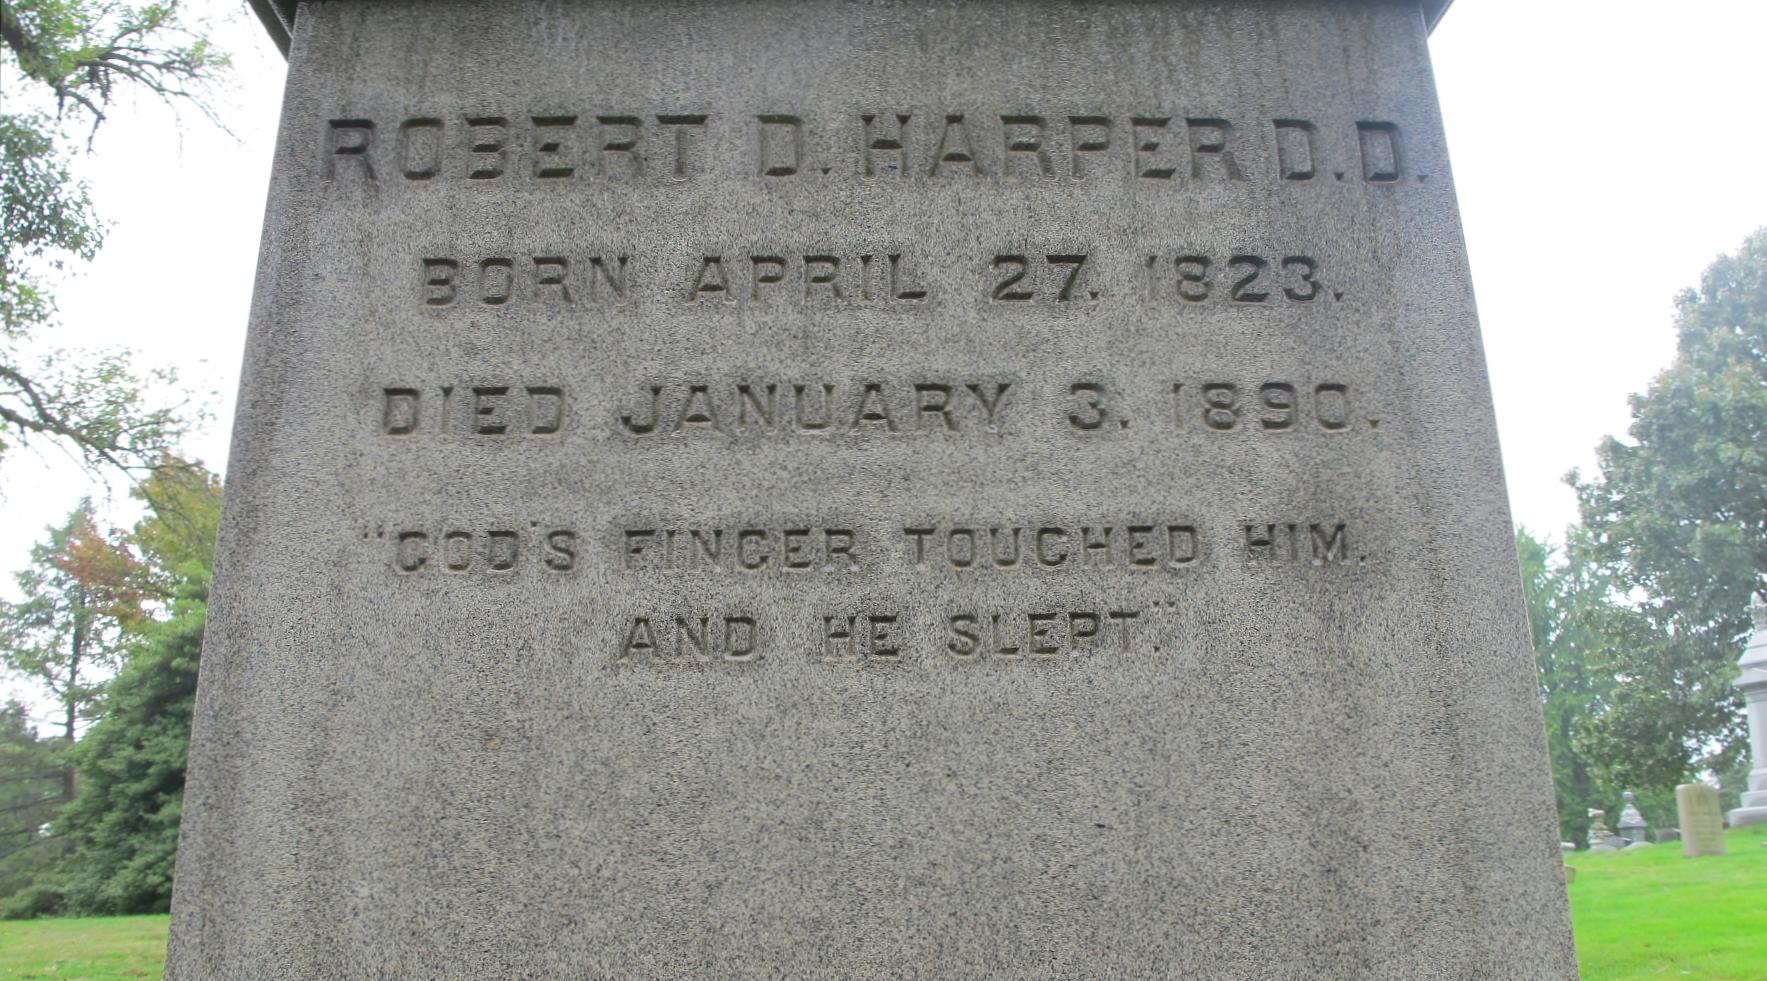 Robert David Harper is buried at West Laurel Hill Cemetery, Bala Cynwyd, Pennsylvania.